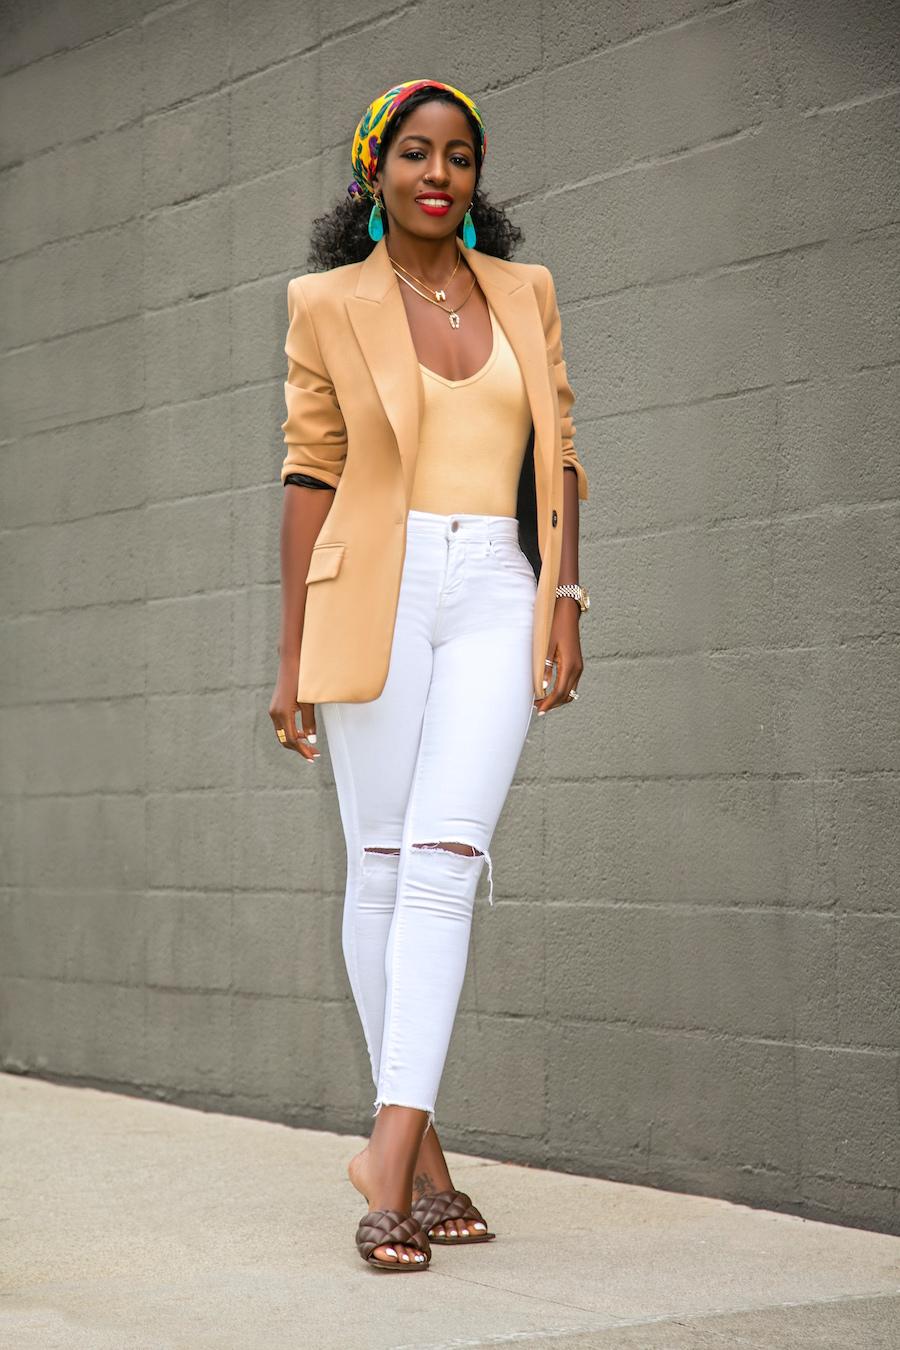 Style Pantry Oversized Blazer Bodysuit Ripped White